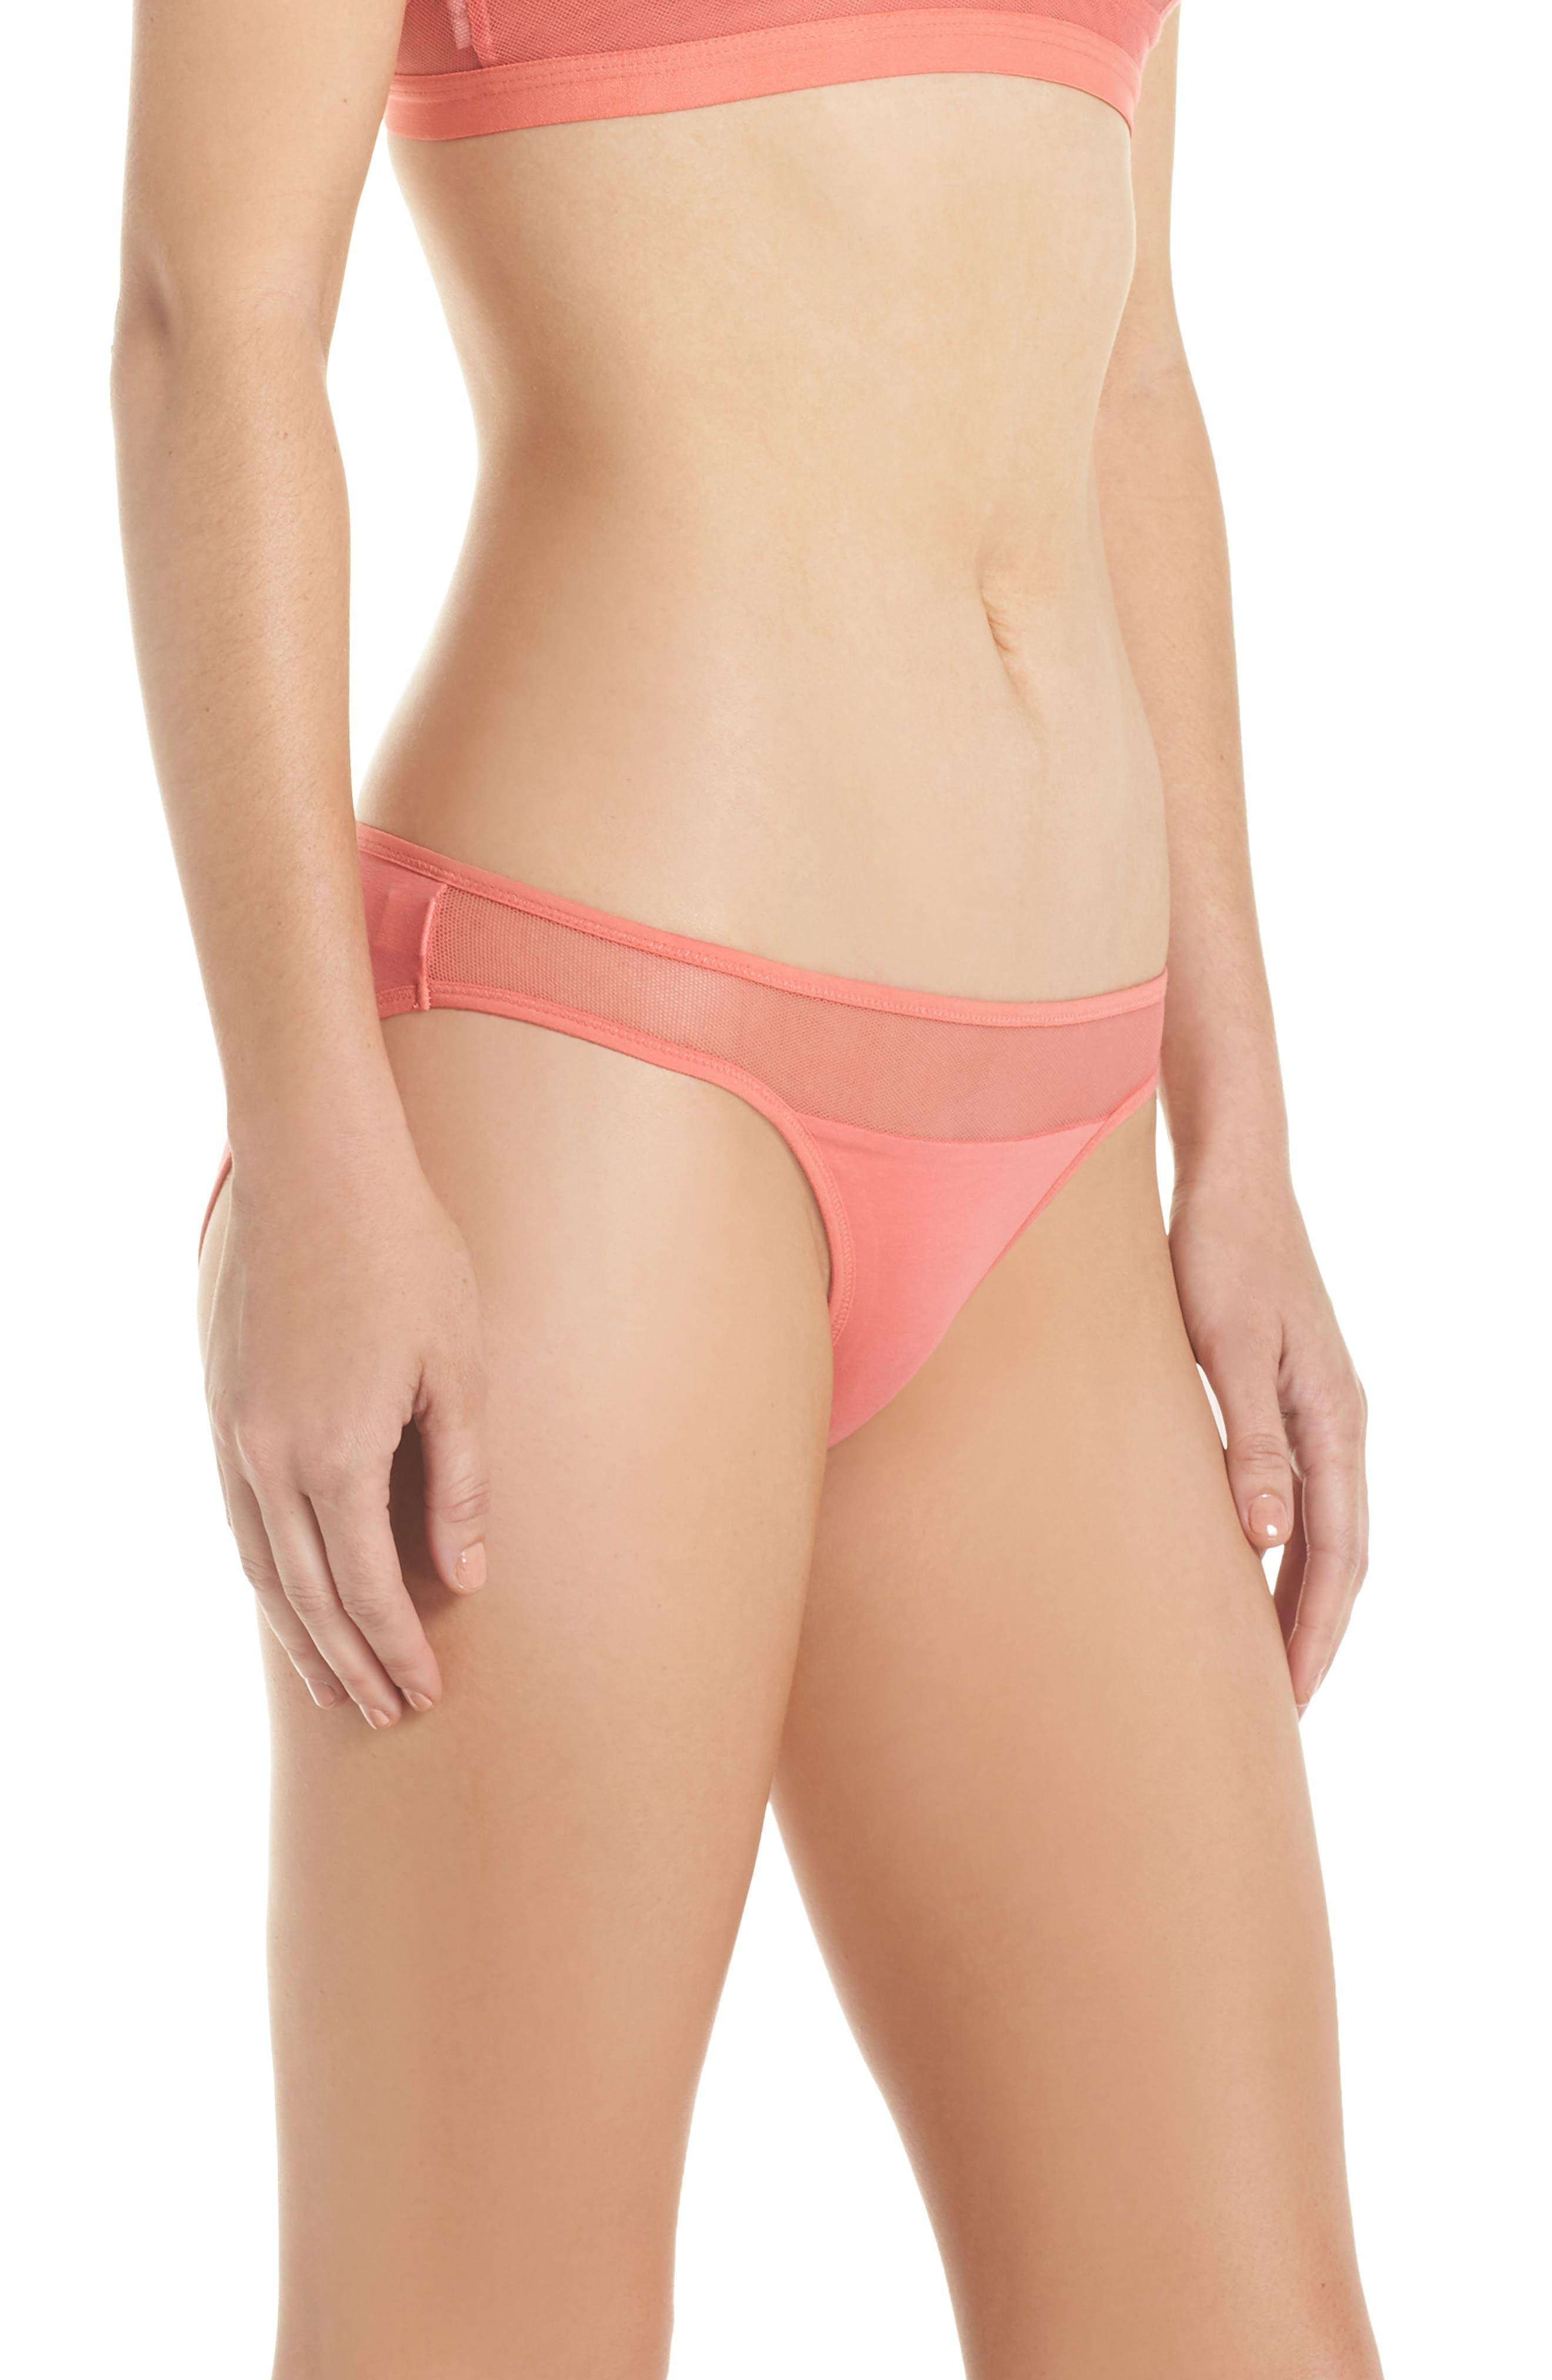 Onyx Tulle Bikini,                             Alternate thumbnail 3, color,                             Spiced Coral